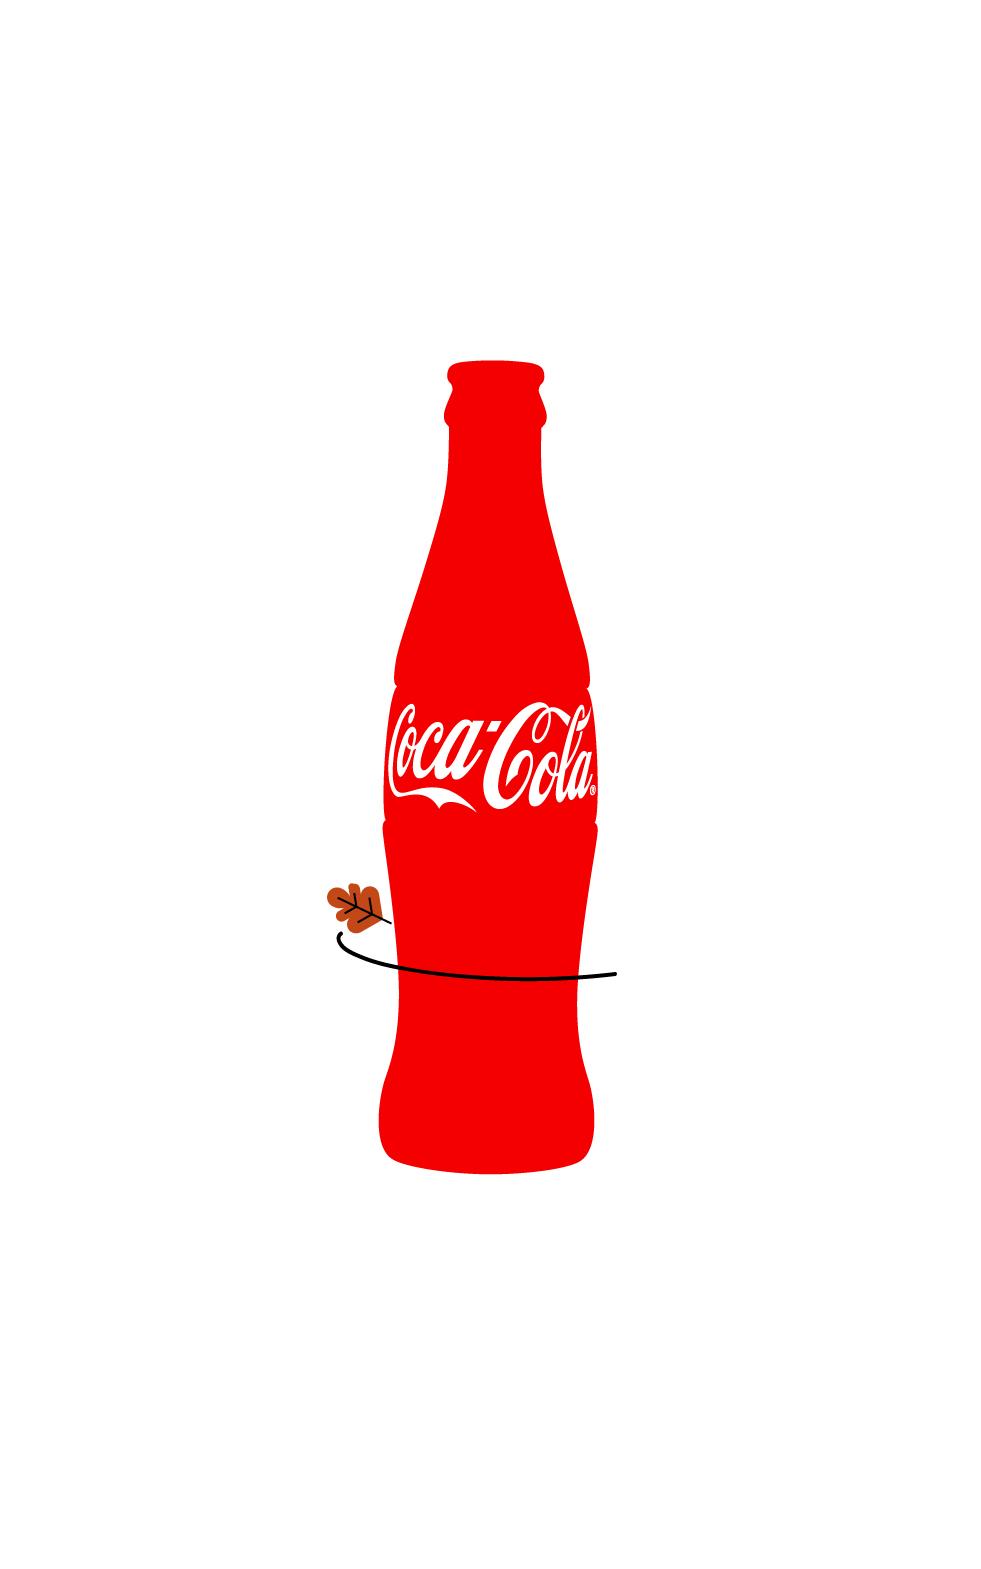 Coke_Thanksgiving_v14_ac_1 copy 3.jpg